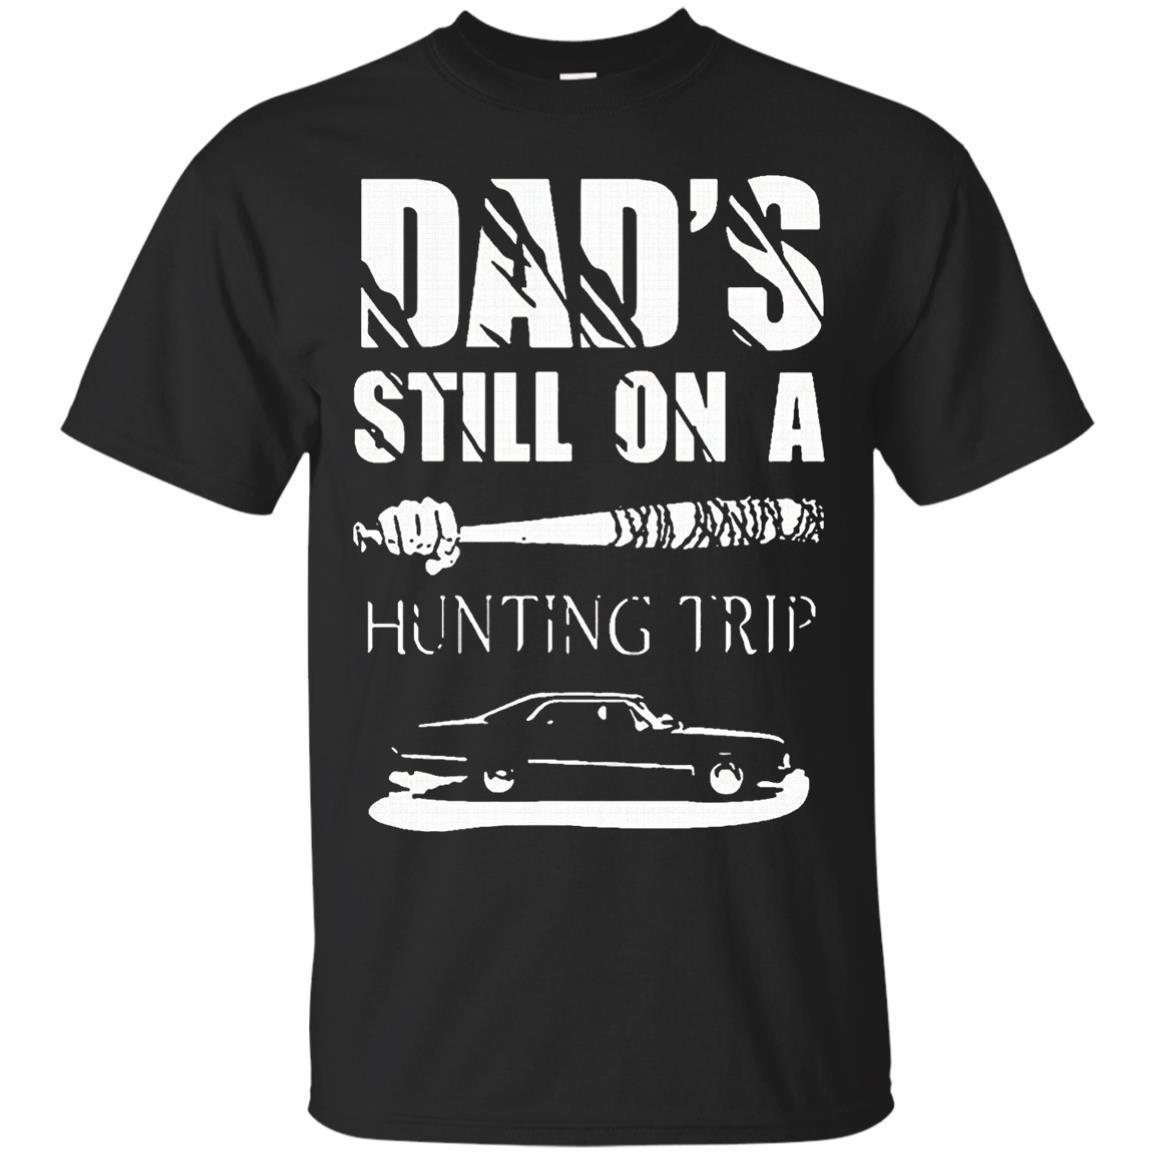 DADS STILL ON HUNTING TRIP T-Shirt